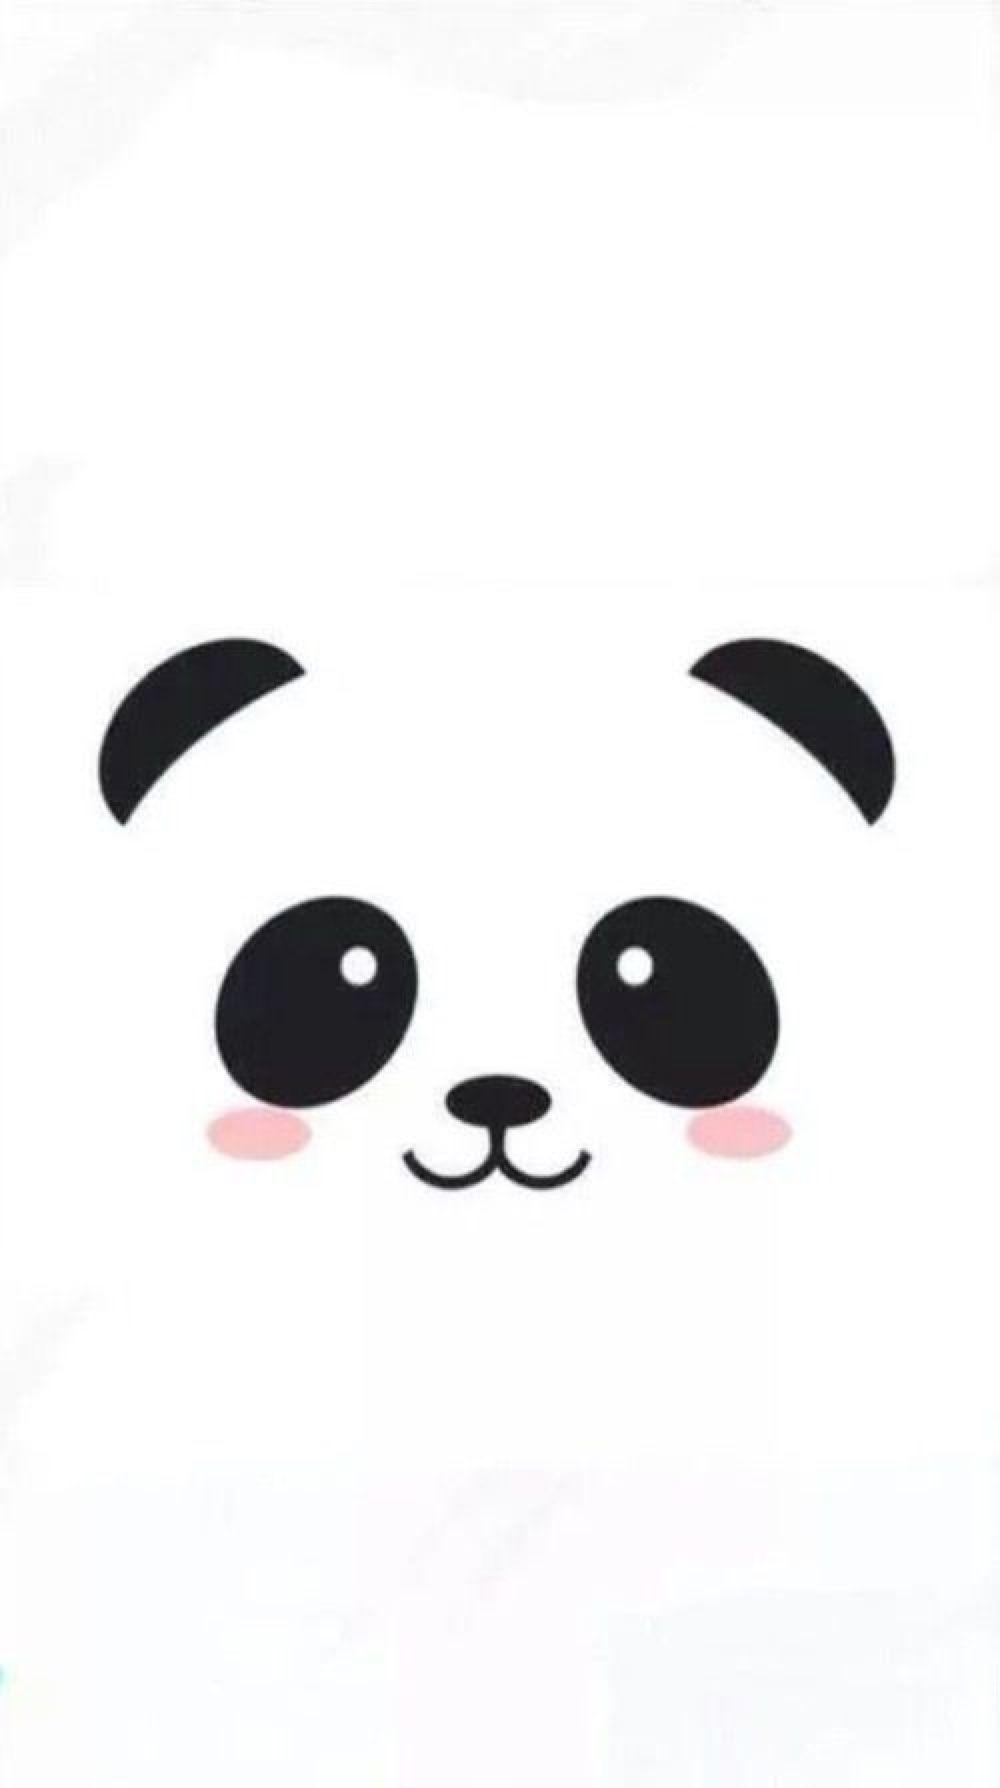 Cool Wallpaper Iphone Tumblr 660 Wallpaper Iphone Cute Cute Panda Wallpaper Panda Wallpaper Iphone